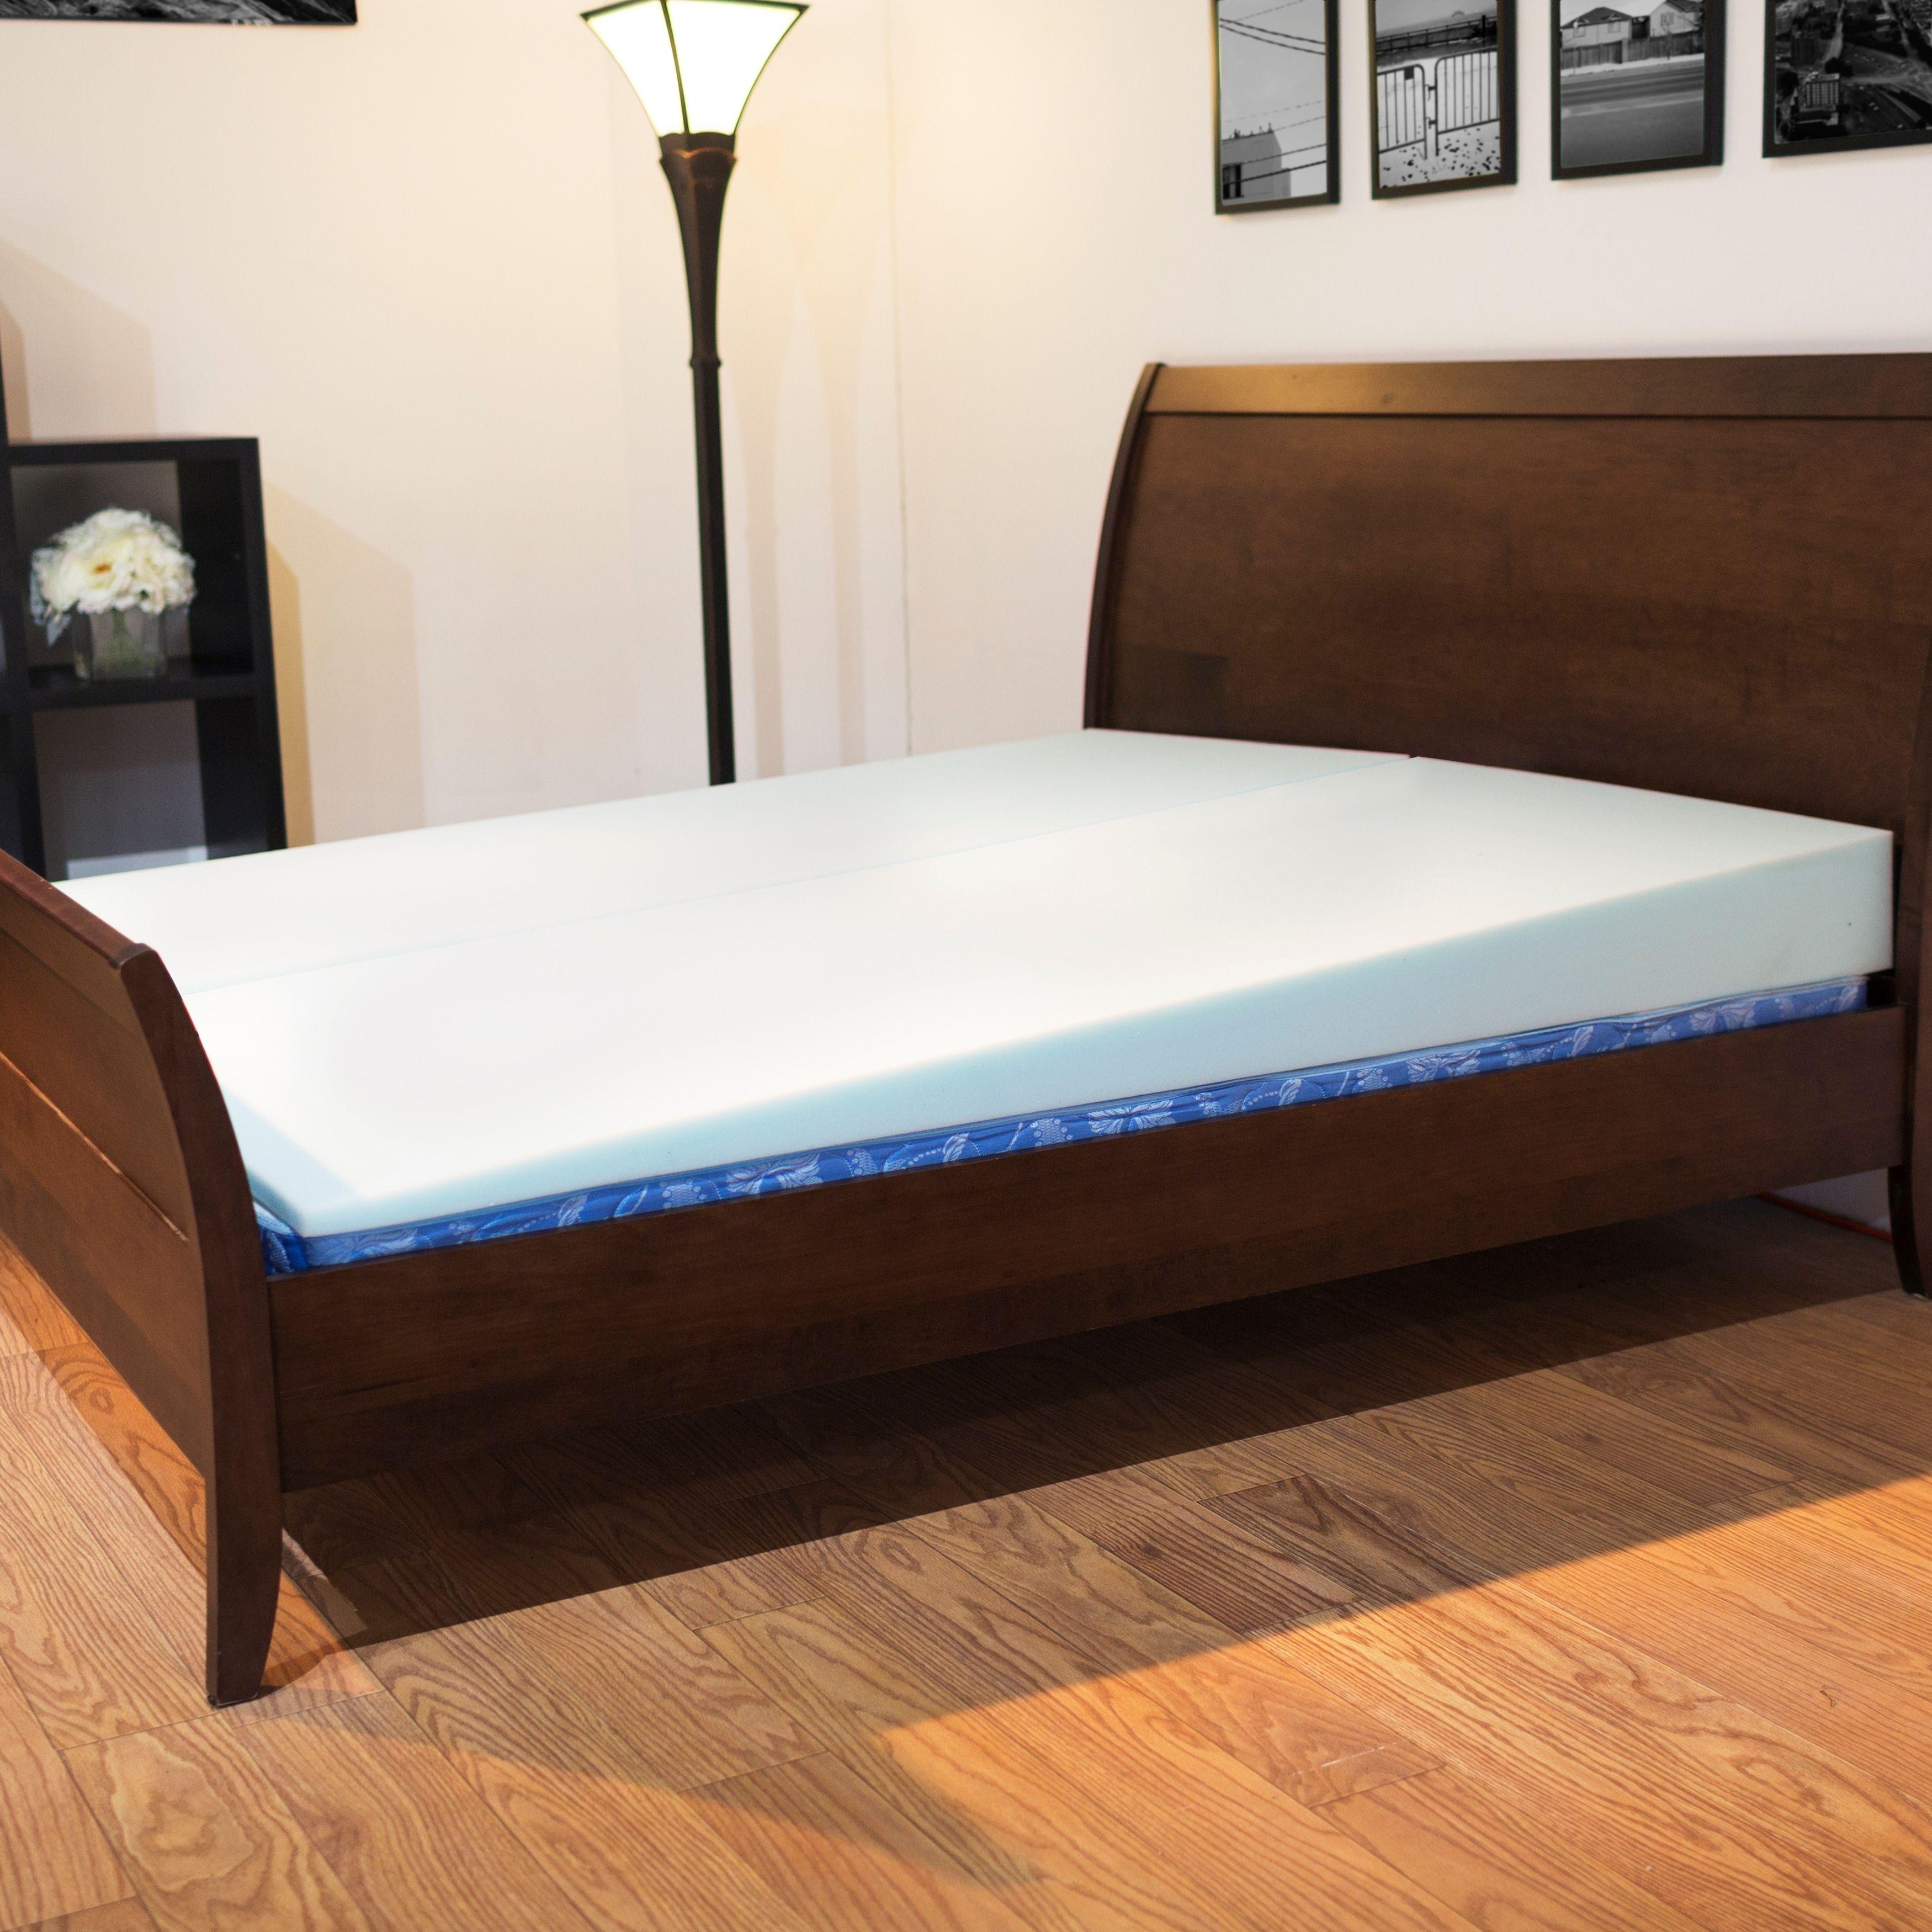 Avana Mattress Elevator Under Bed 7 Inch Incline Foam Support